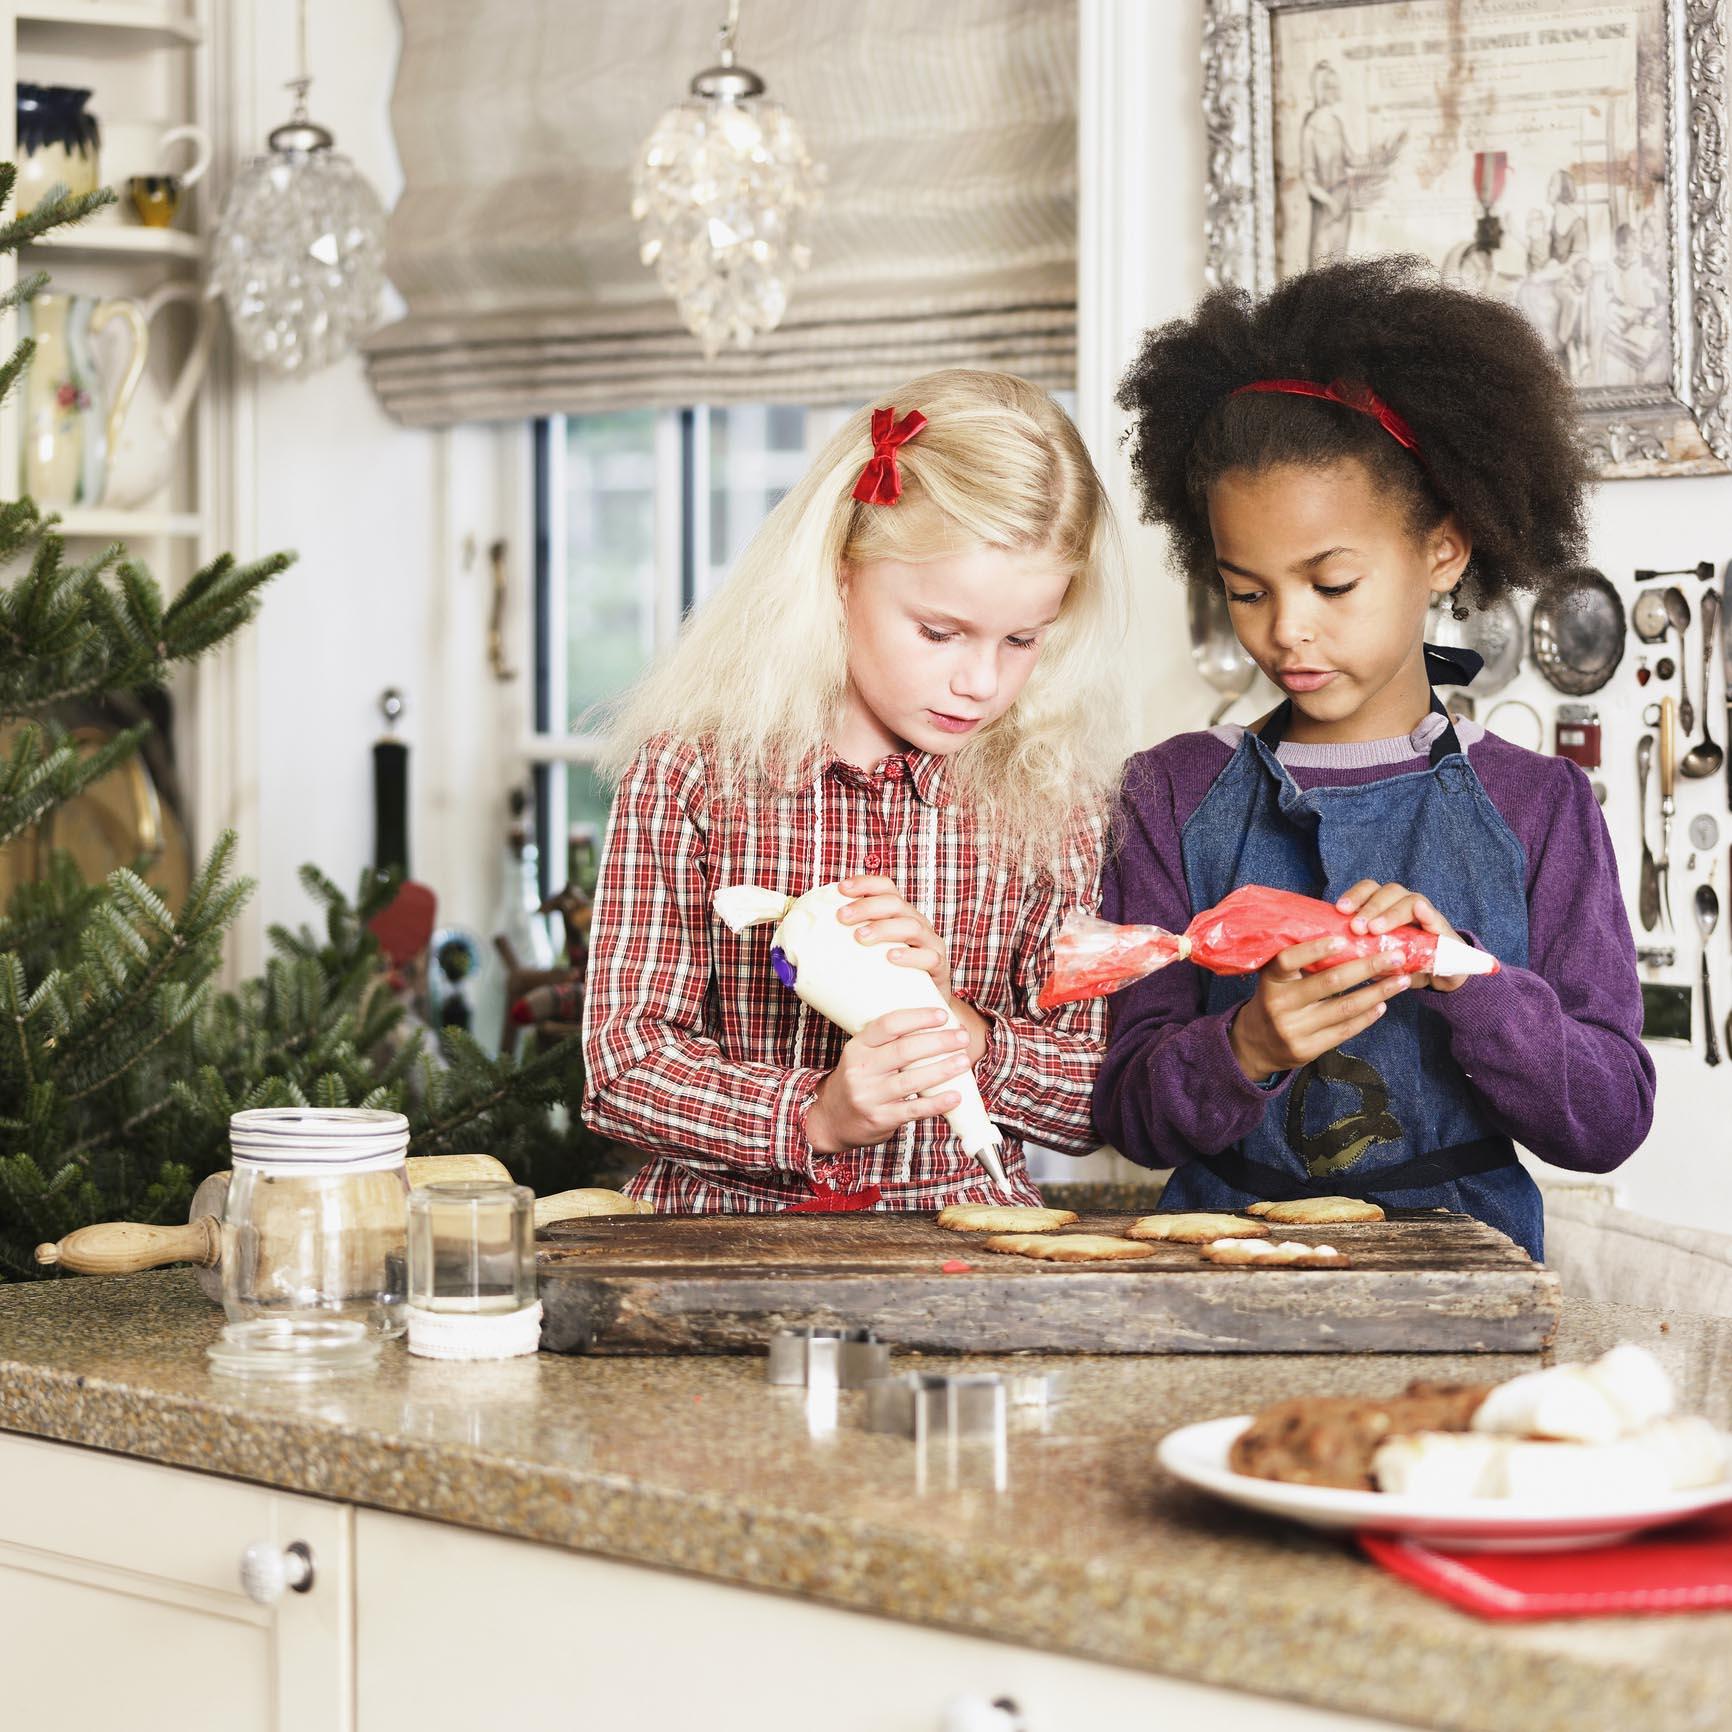 Girls baking Christmas cookies